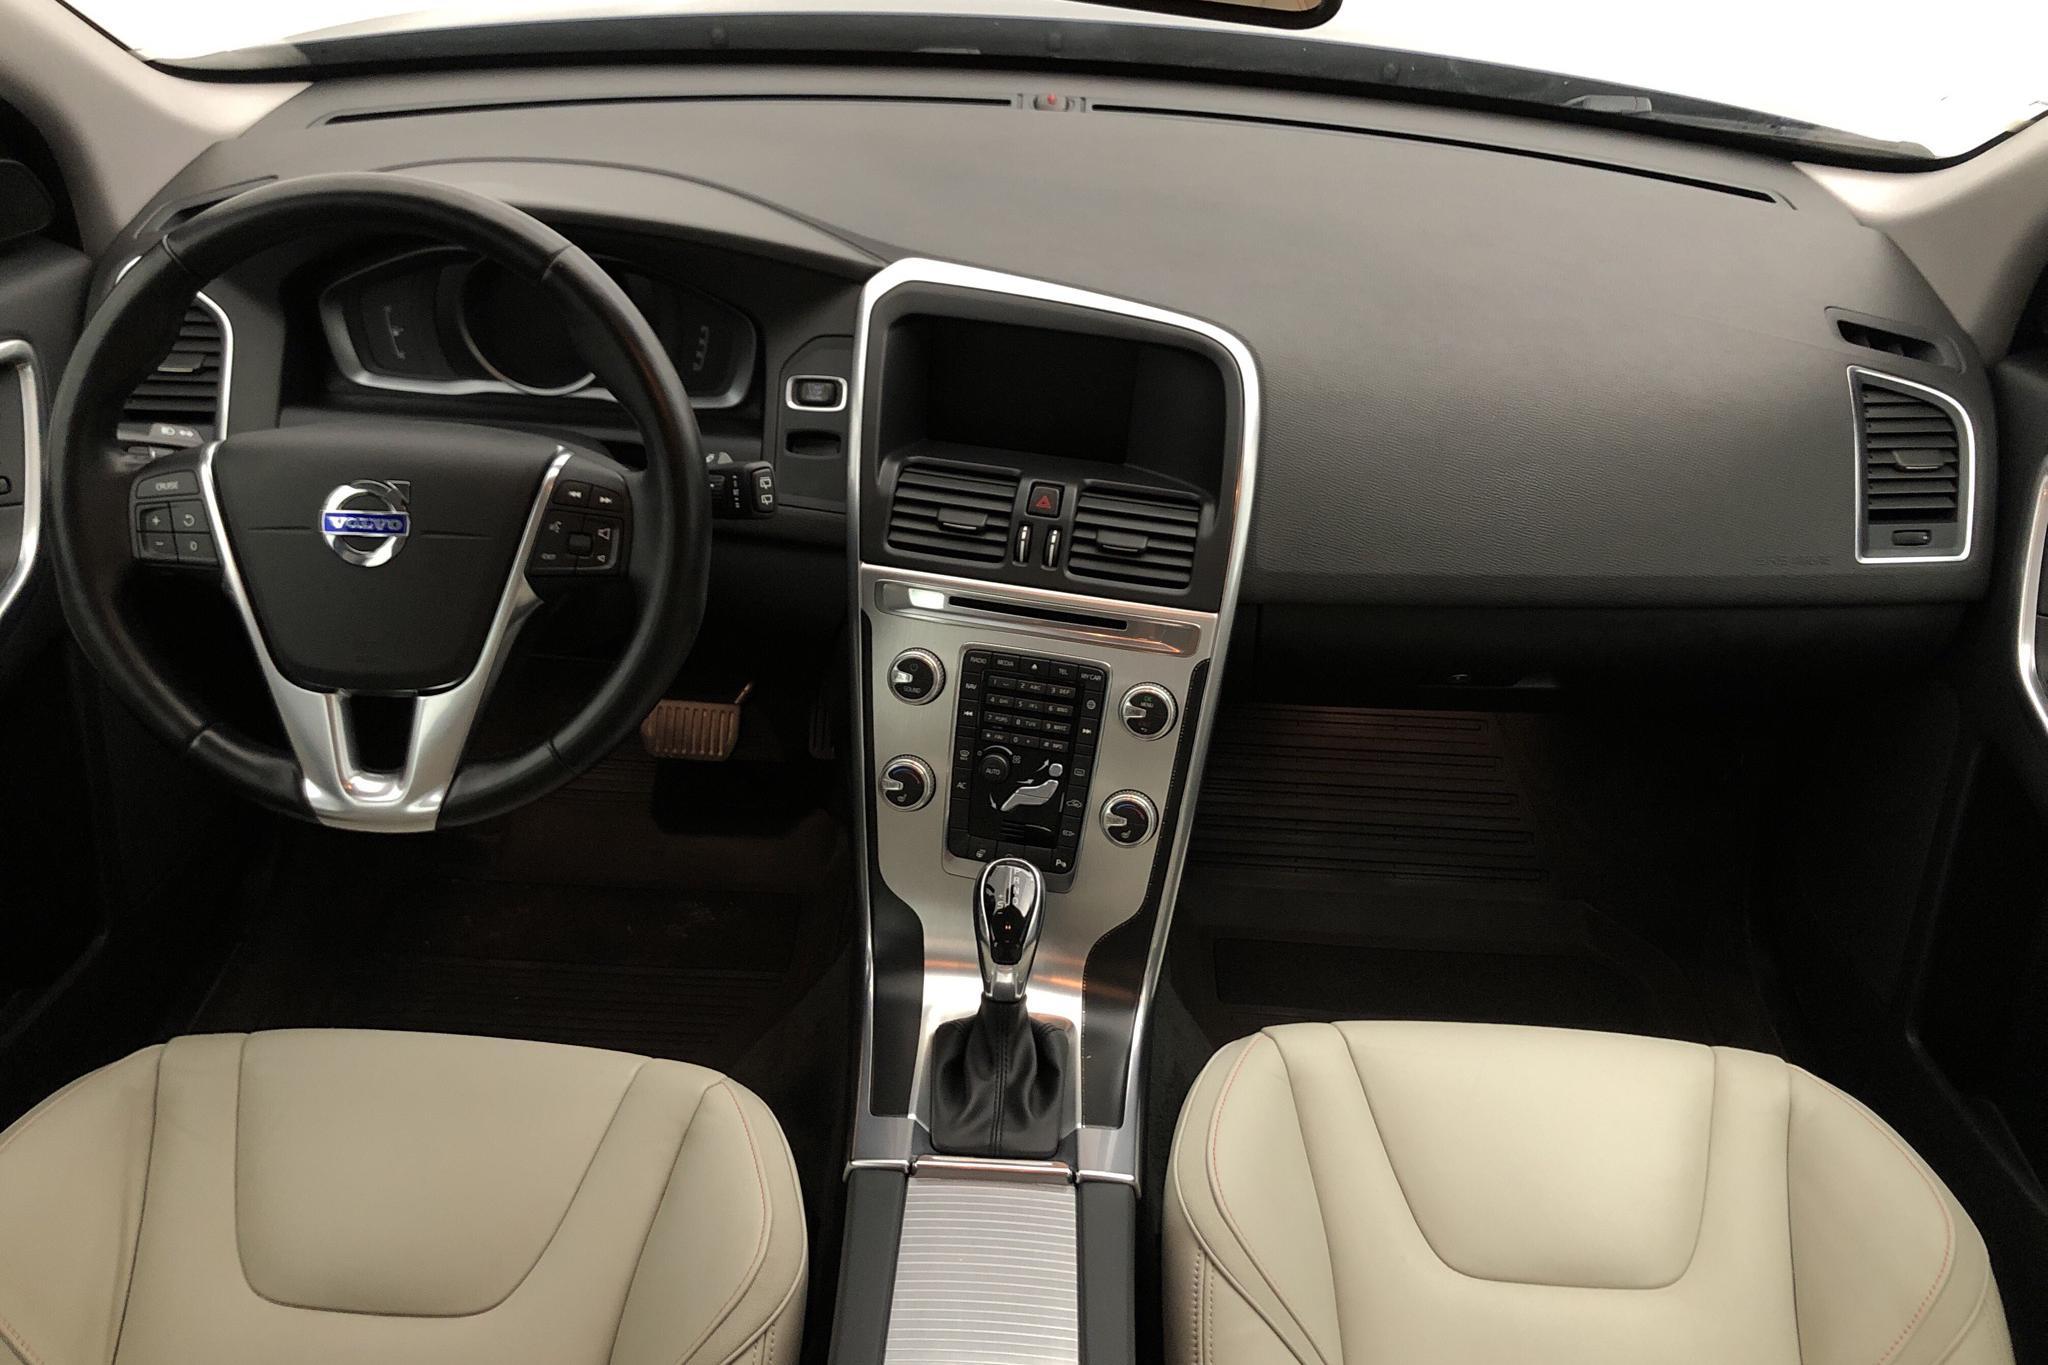 Volvo XC60 D4 2WD (181hk) - 4 978 mil - Automat - blå - 2015